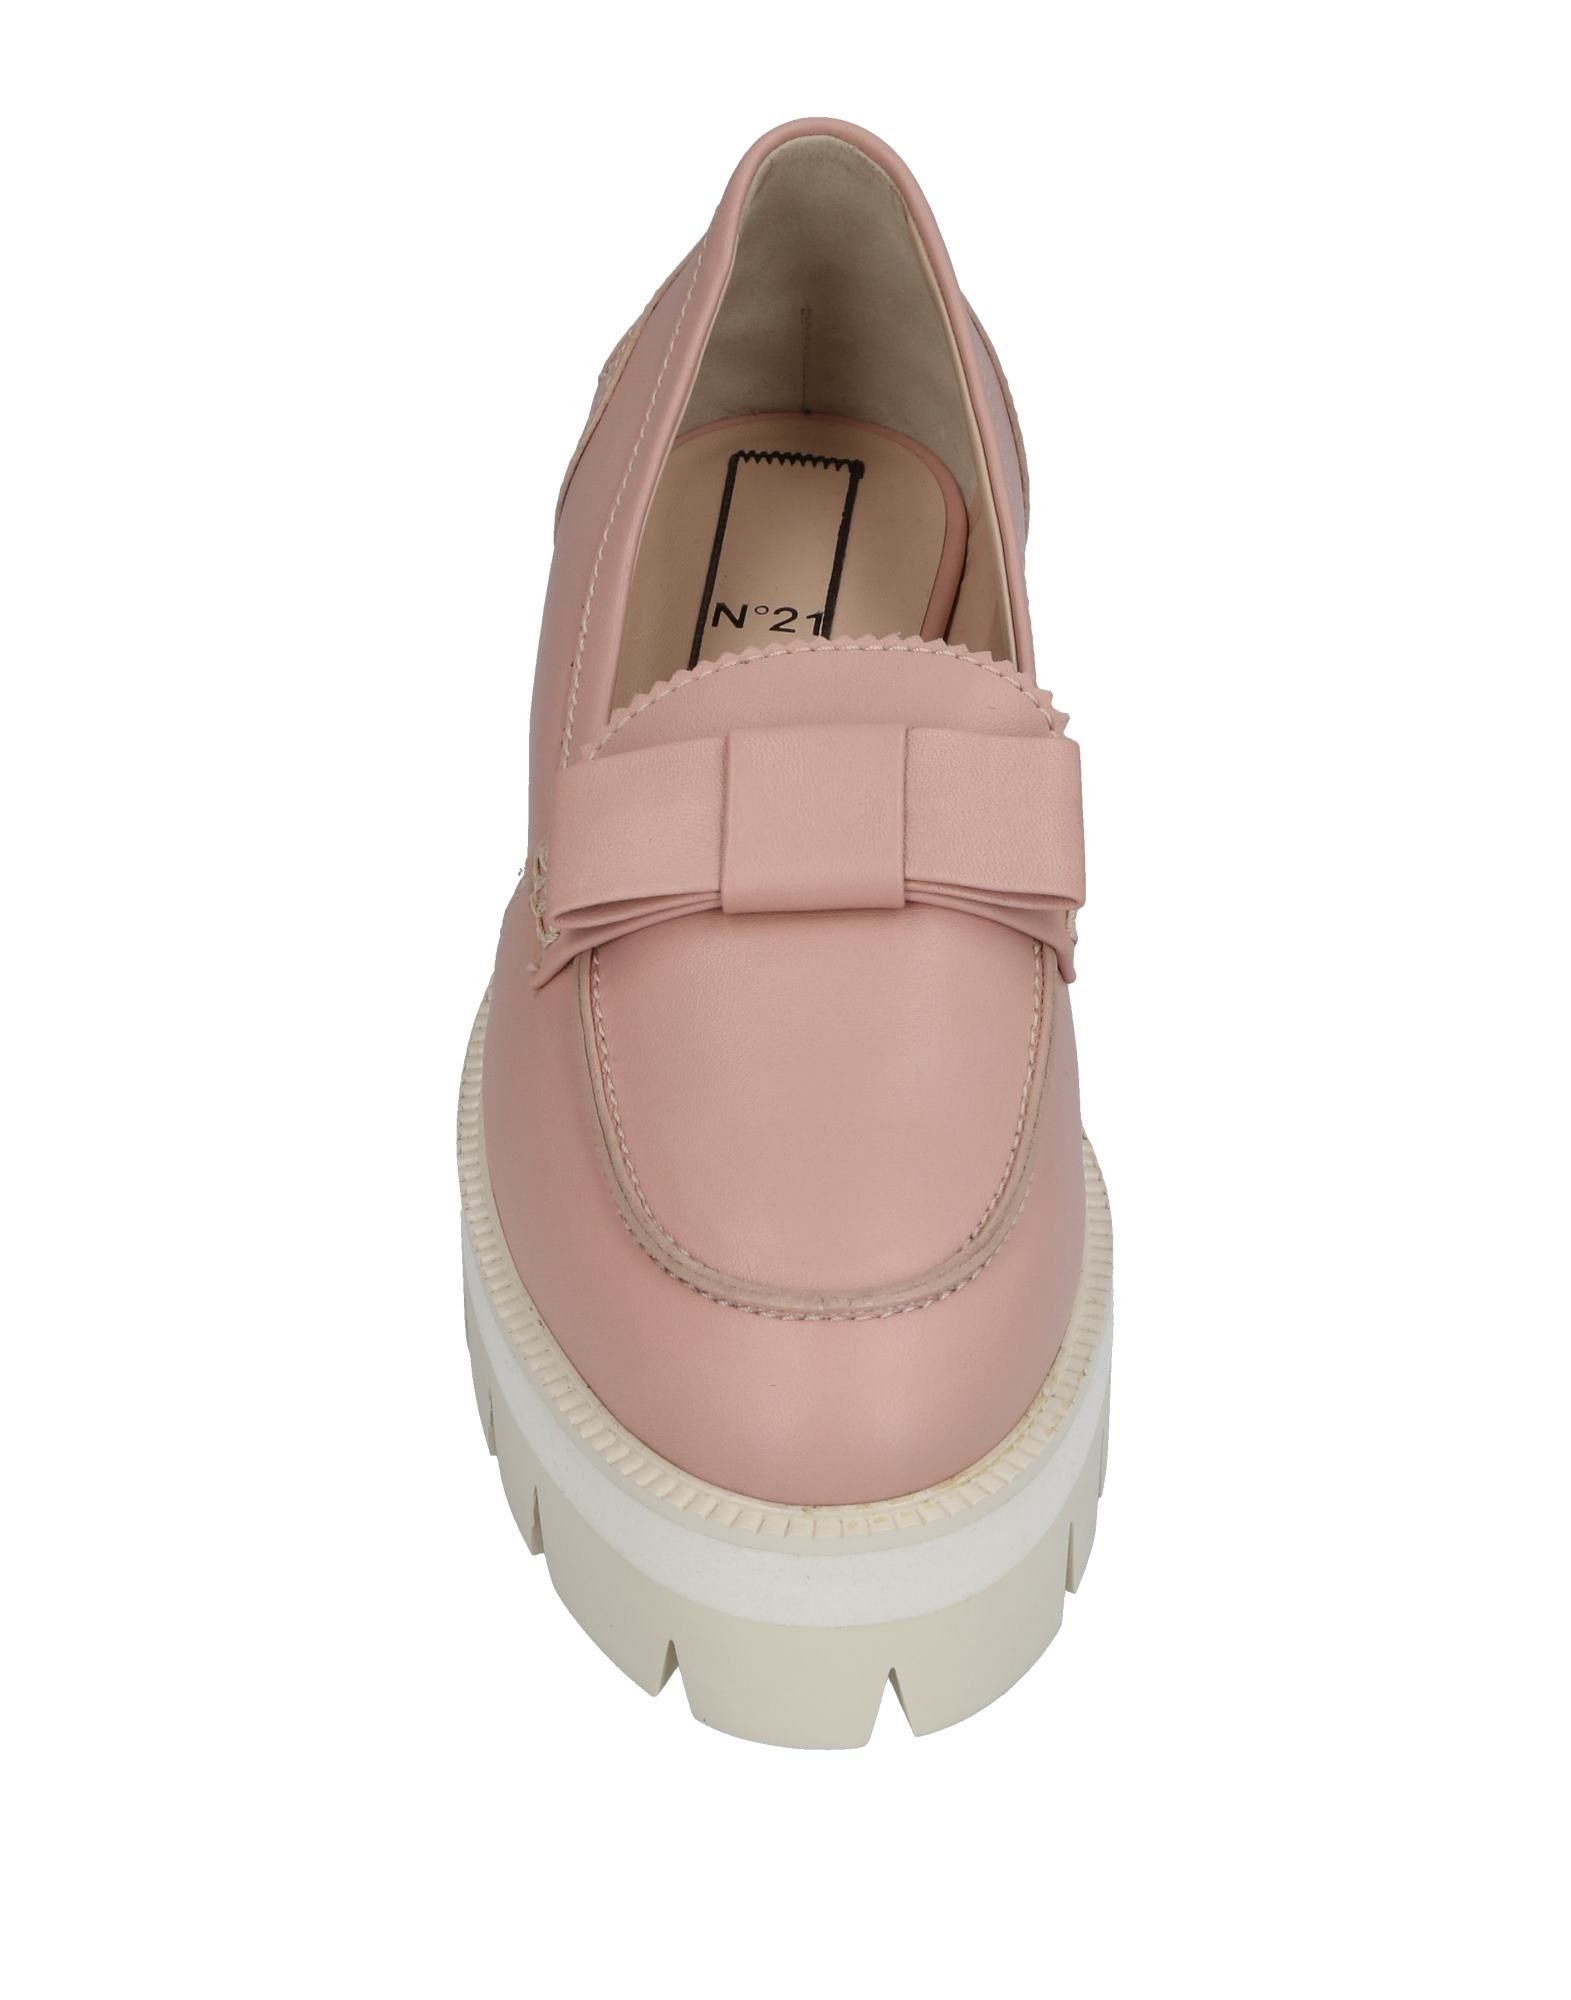 N° 21 Mokassins Damen    44957611UG Neue Schuhe 03eeab